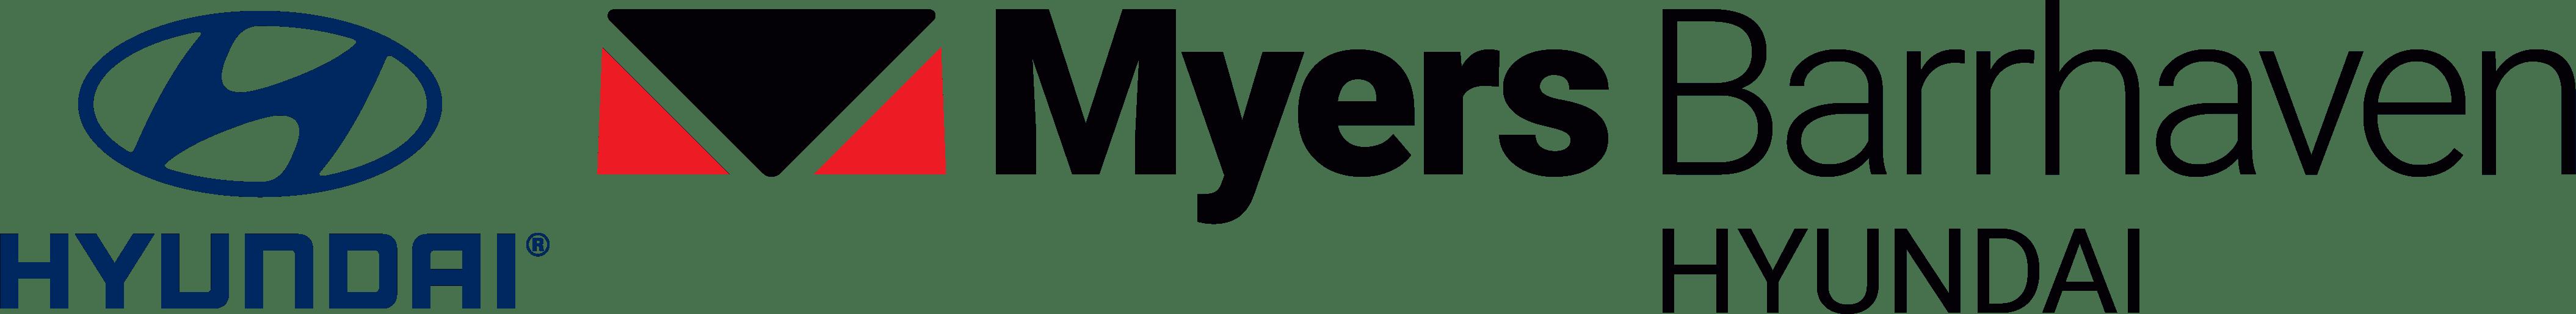 Premier Hyundai Dealership in Ottawa   Myers Barrhaven Hyundai